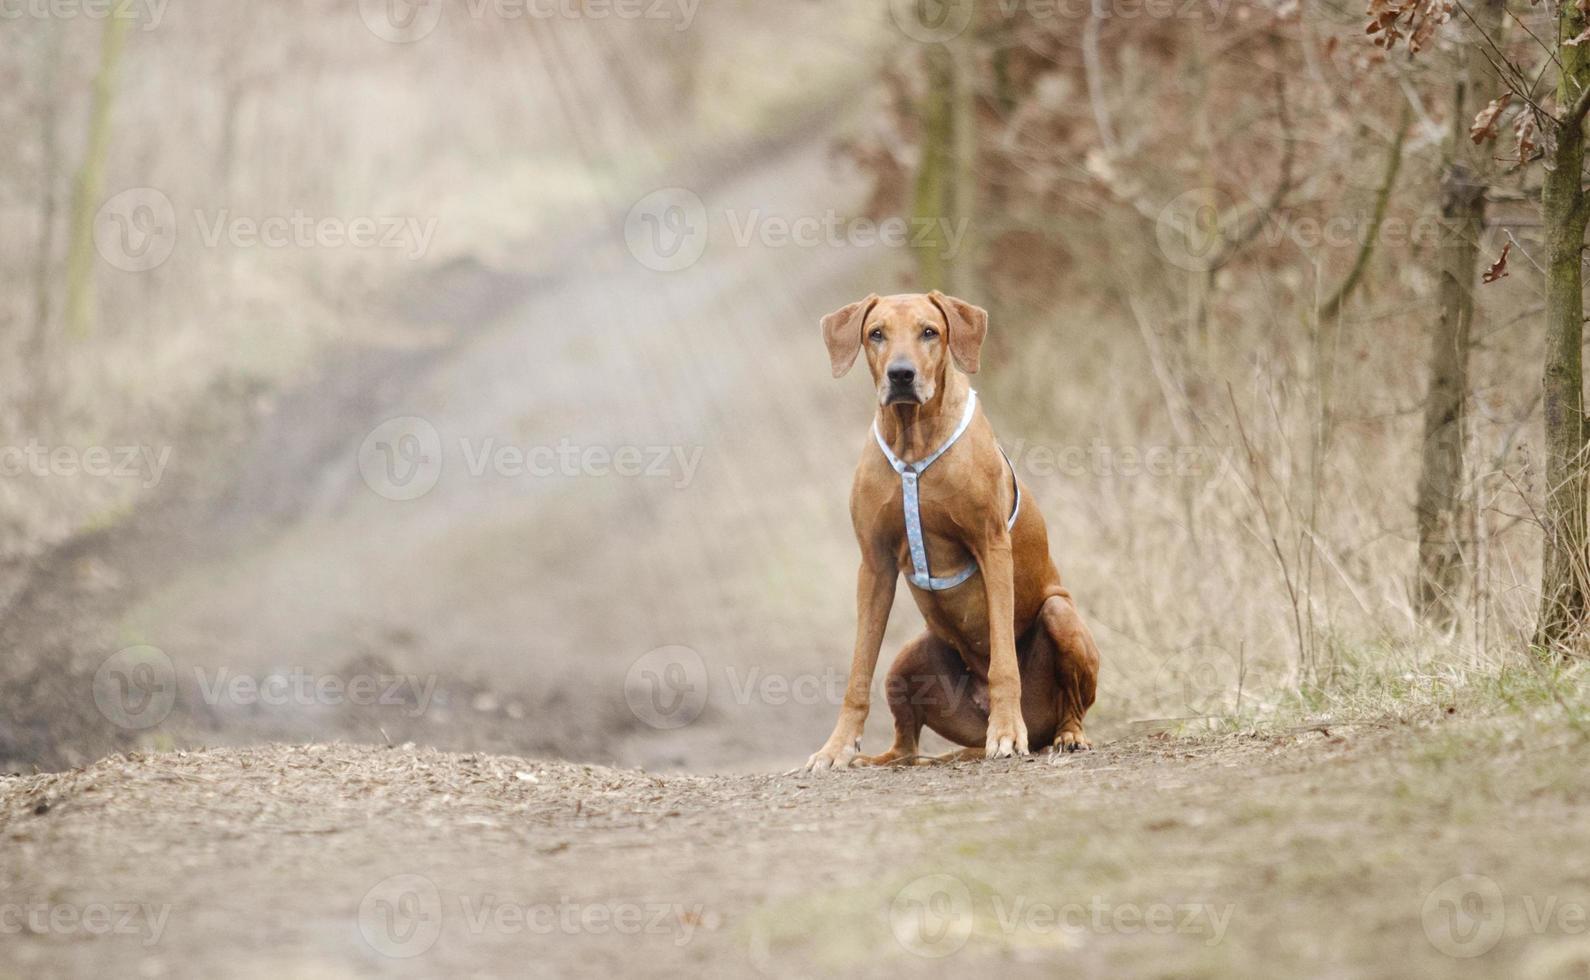 ansiedade rhodesian ridgeback cachorro filhote sentado no fundo da primavera foto